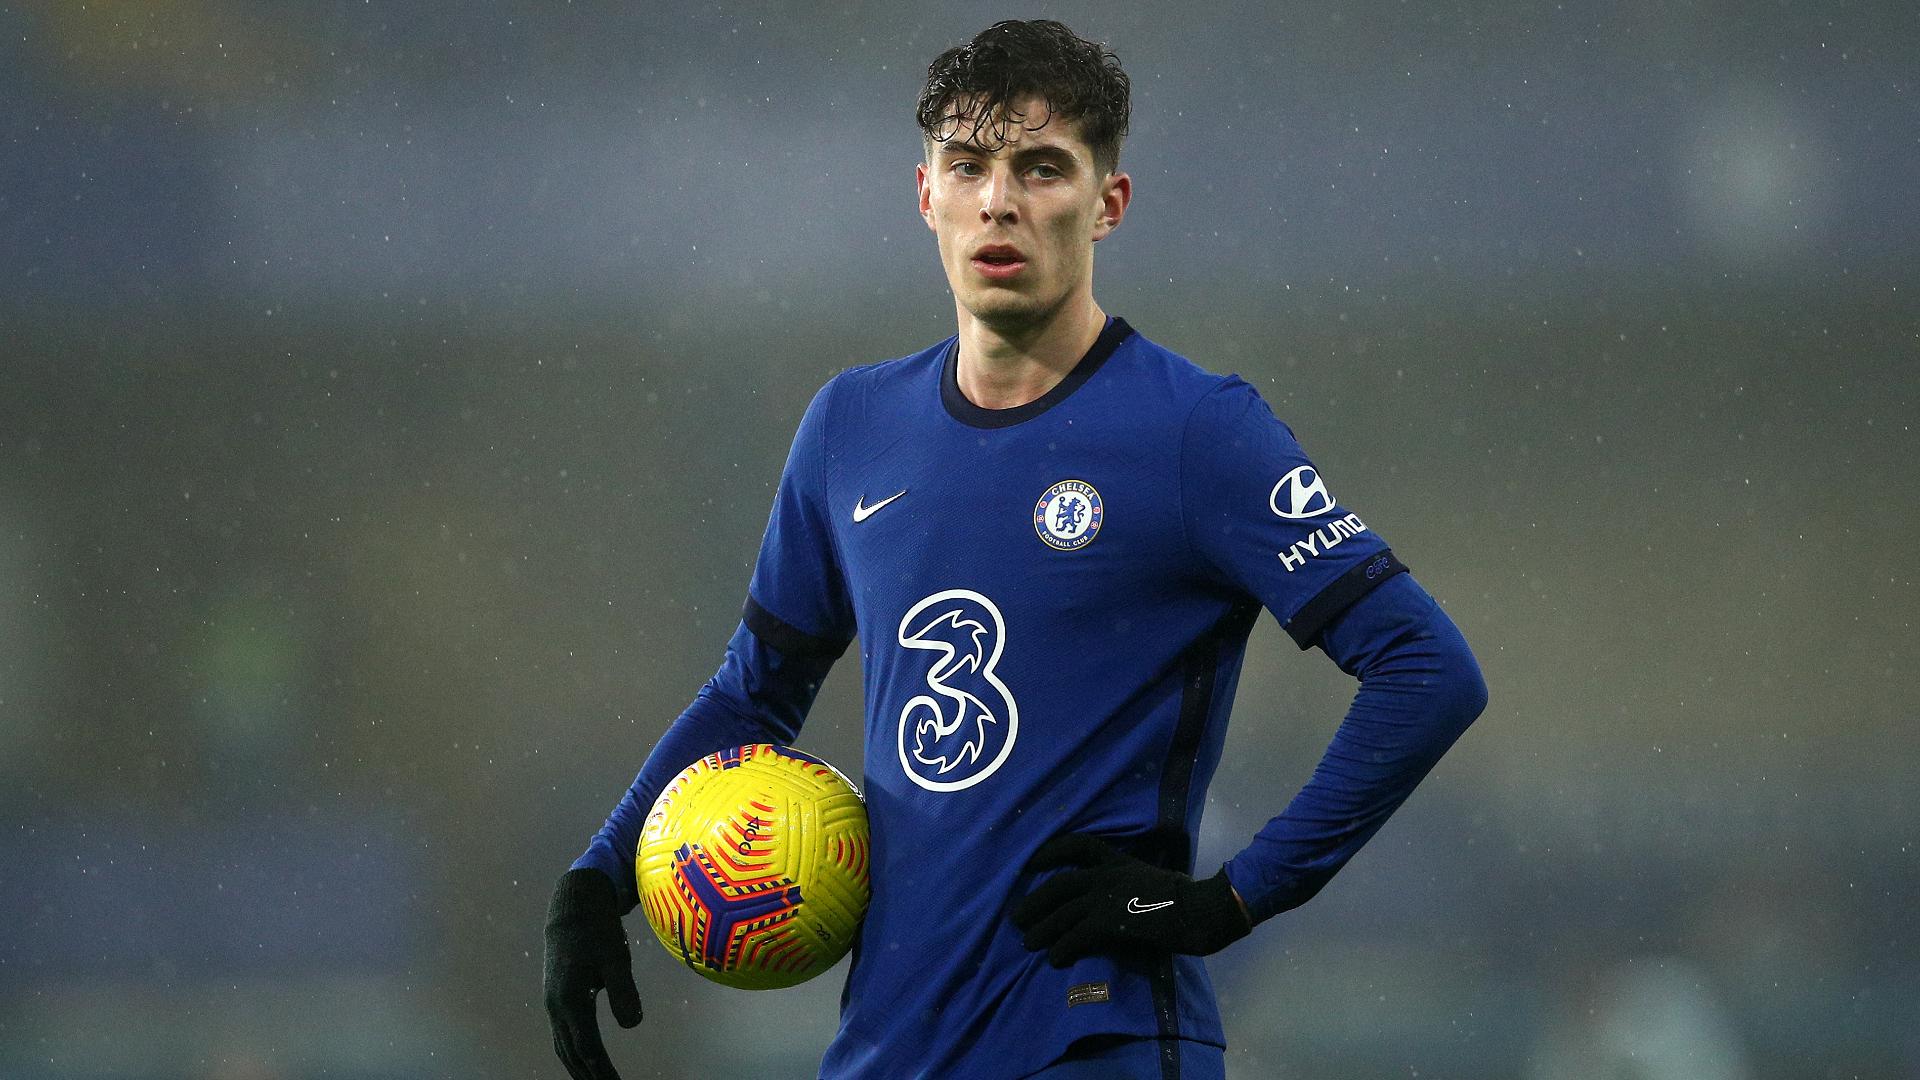 Havertz feeling good after 'tough' Chelsea start, but has he improved under Tuchel?